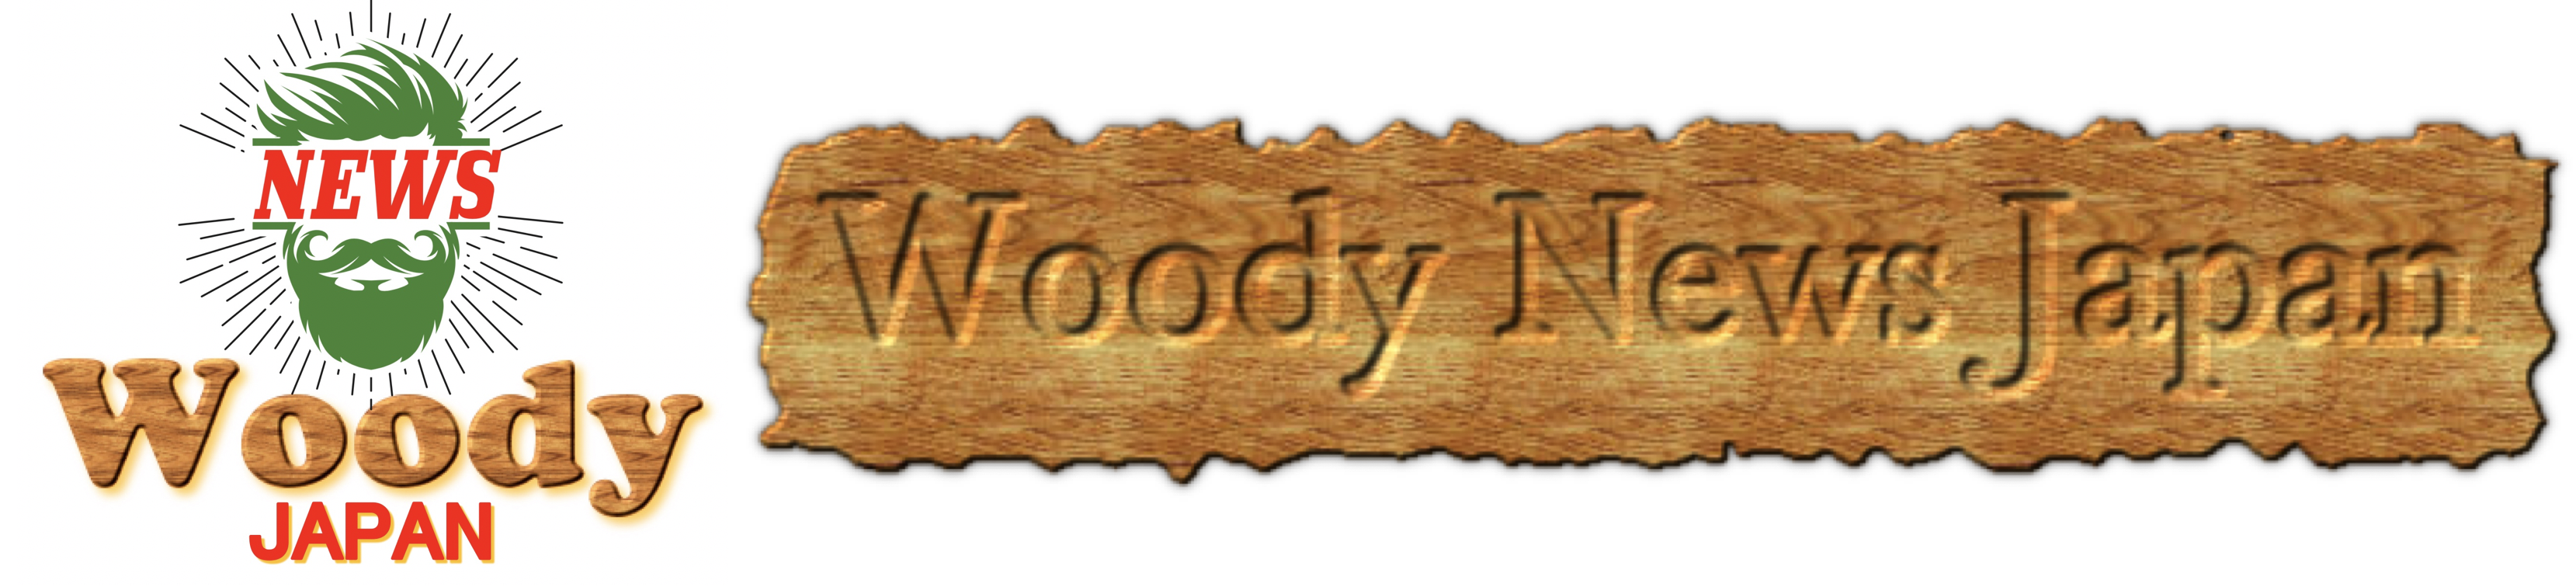 Woody News Japan